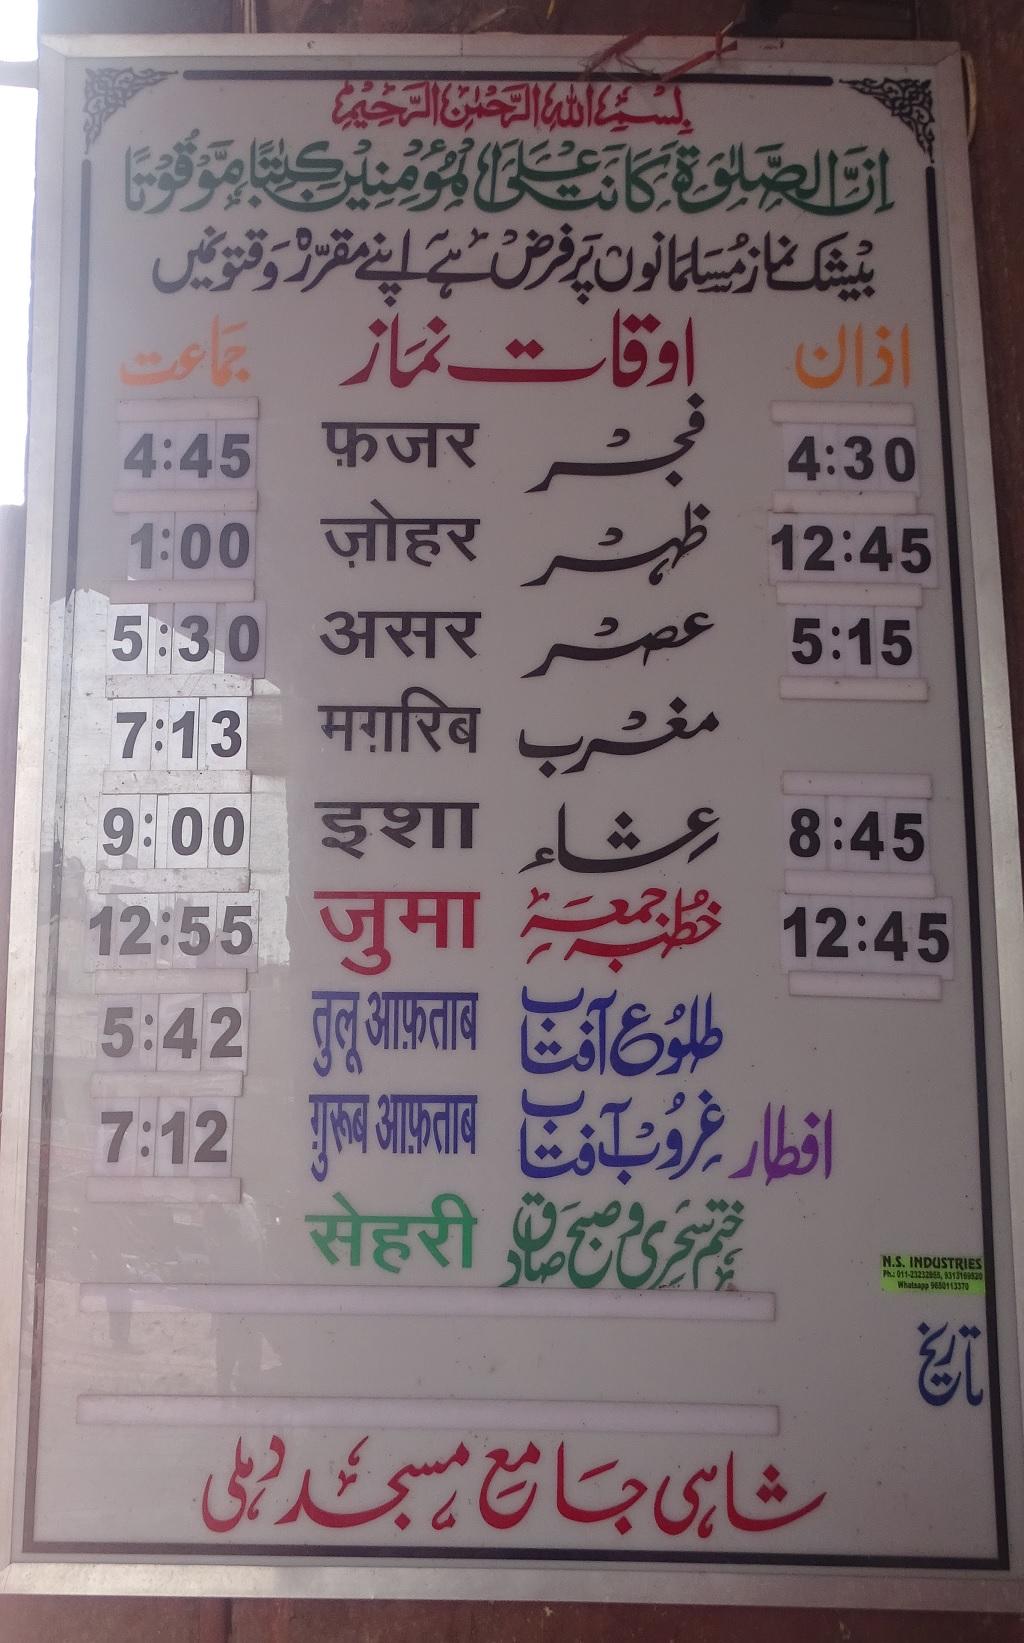 Namaz Time in Shahi Jama Masjid, Old Delhi